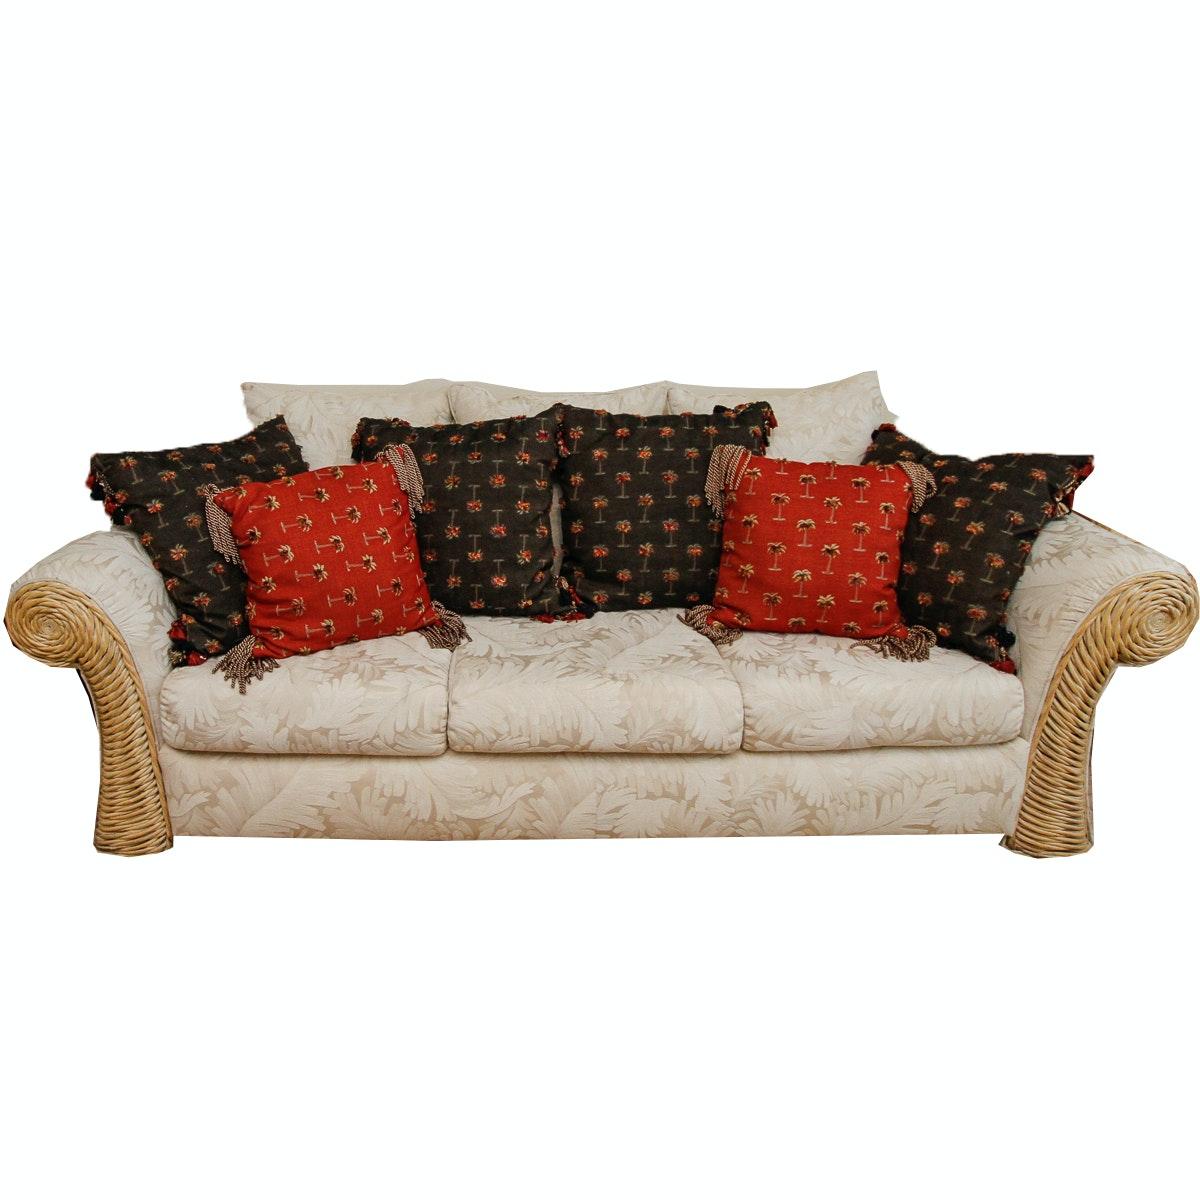 Wicker Accented Coastal Motif Sofa